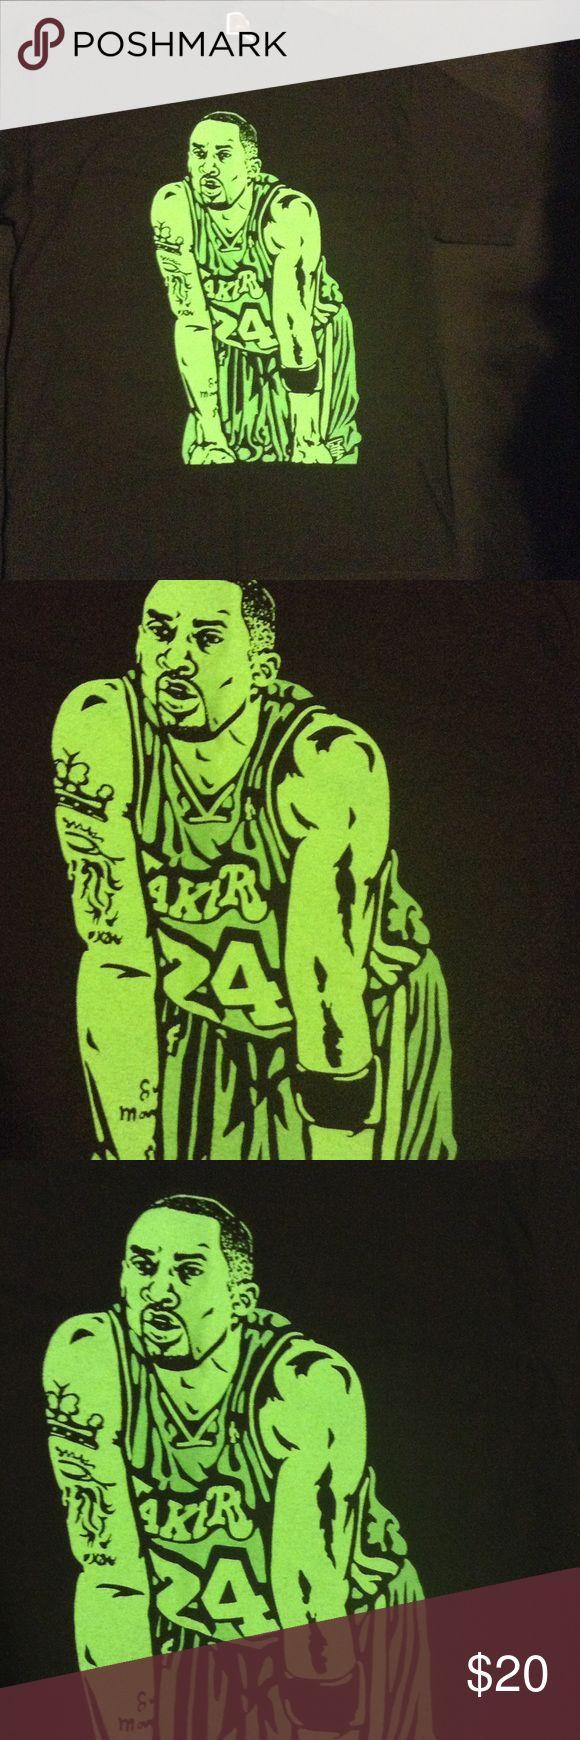 Kobe Bryant t shirt lakers grinch Nike rare NBA Size large brand new cajmear Shirts Tees - Short Sleeve